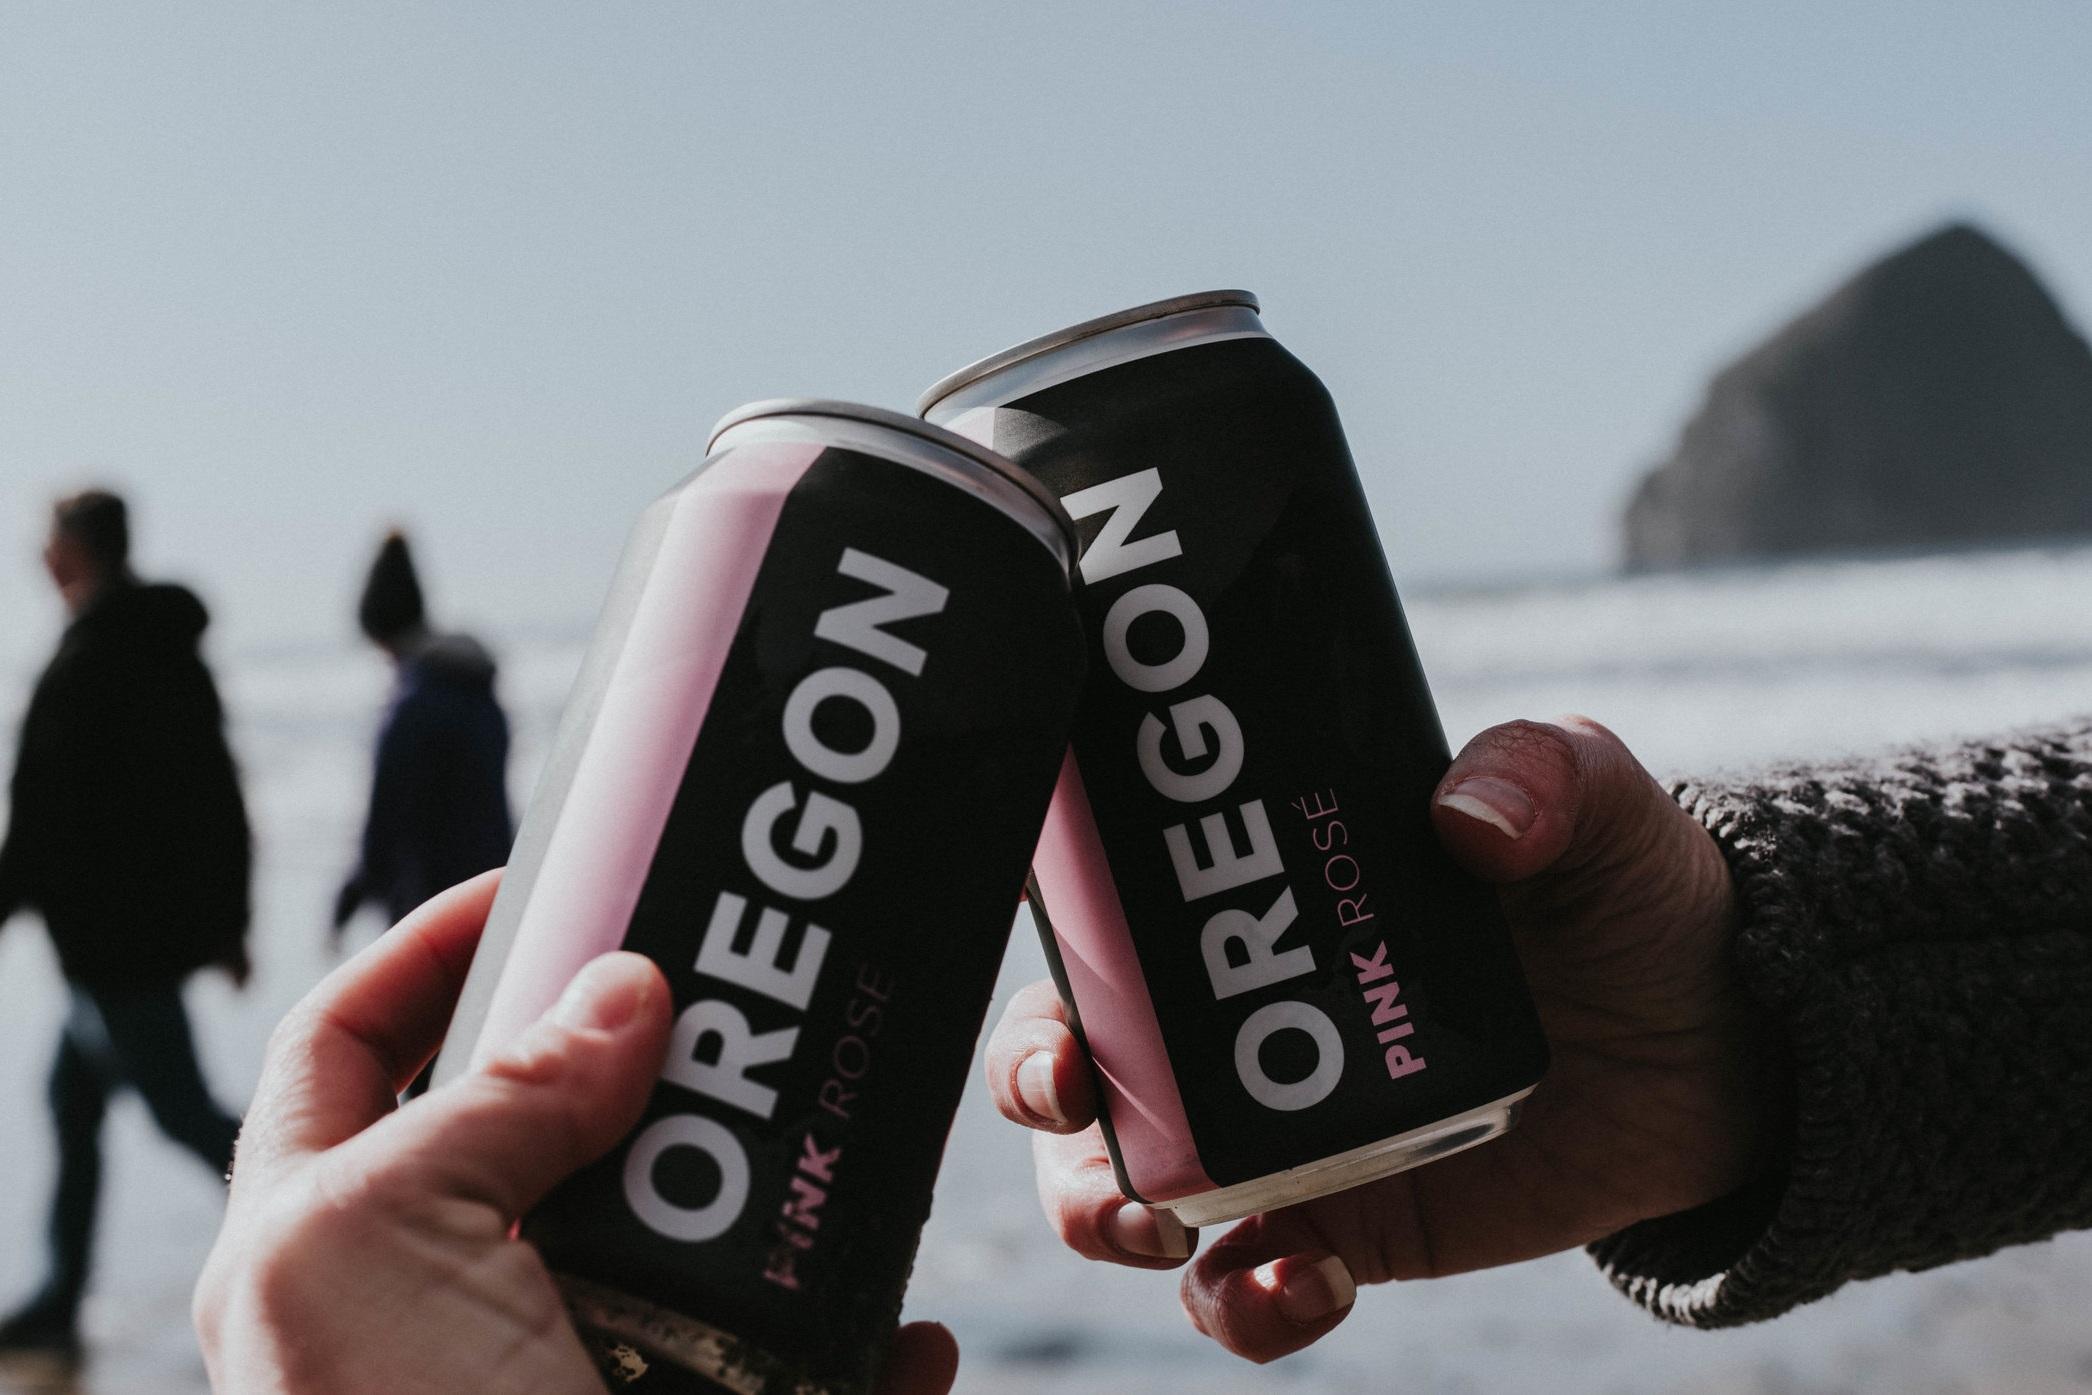 canned-oregon-coast-5613+%28002%29.jpg